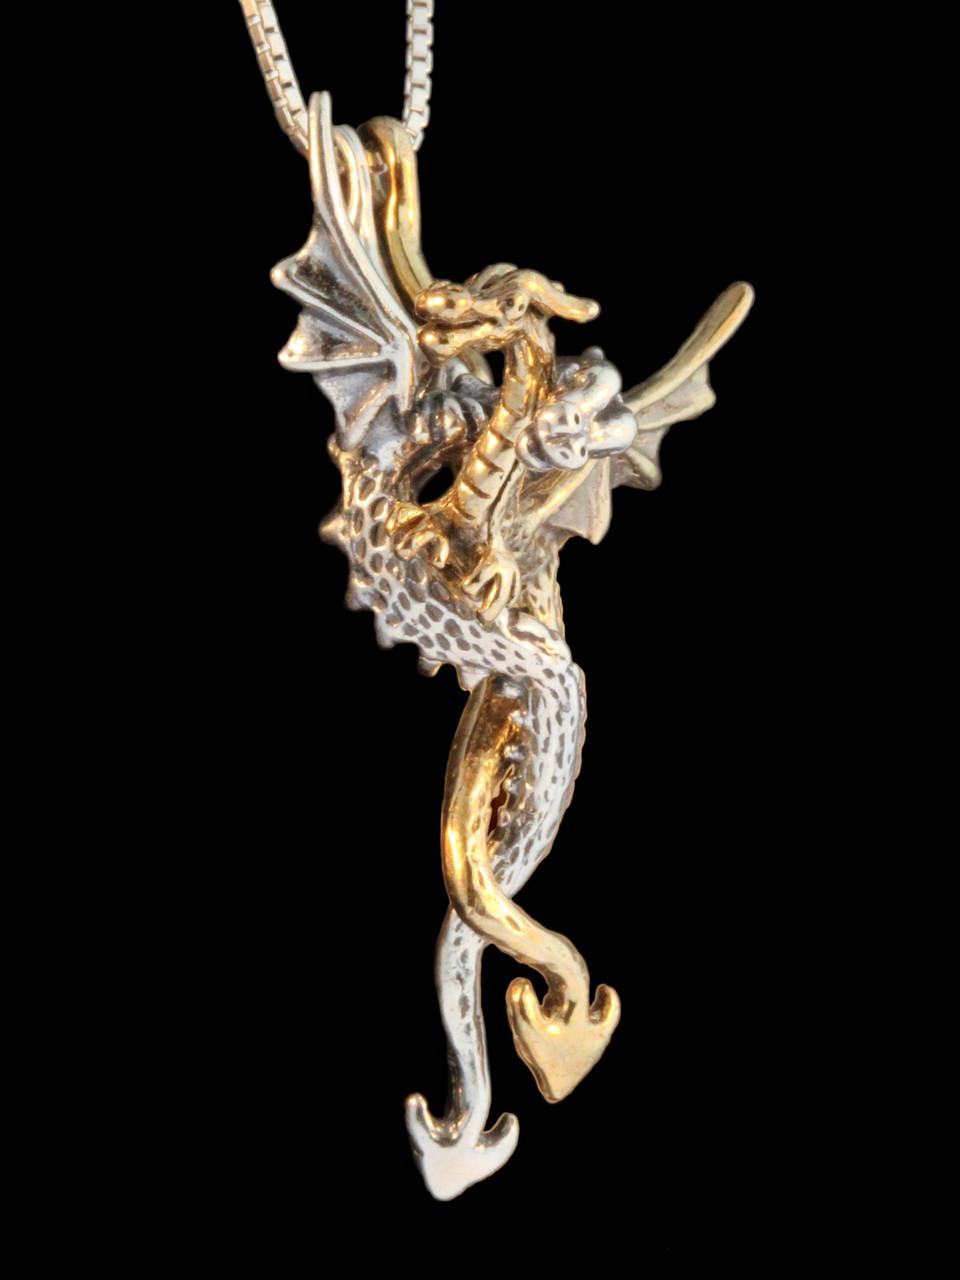 Dragon desire pendant two piece pendant jewelry gold dragon desire pendant two pieces 14k gold and silver aloadofball Choice Image